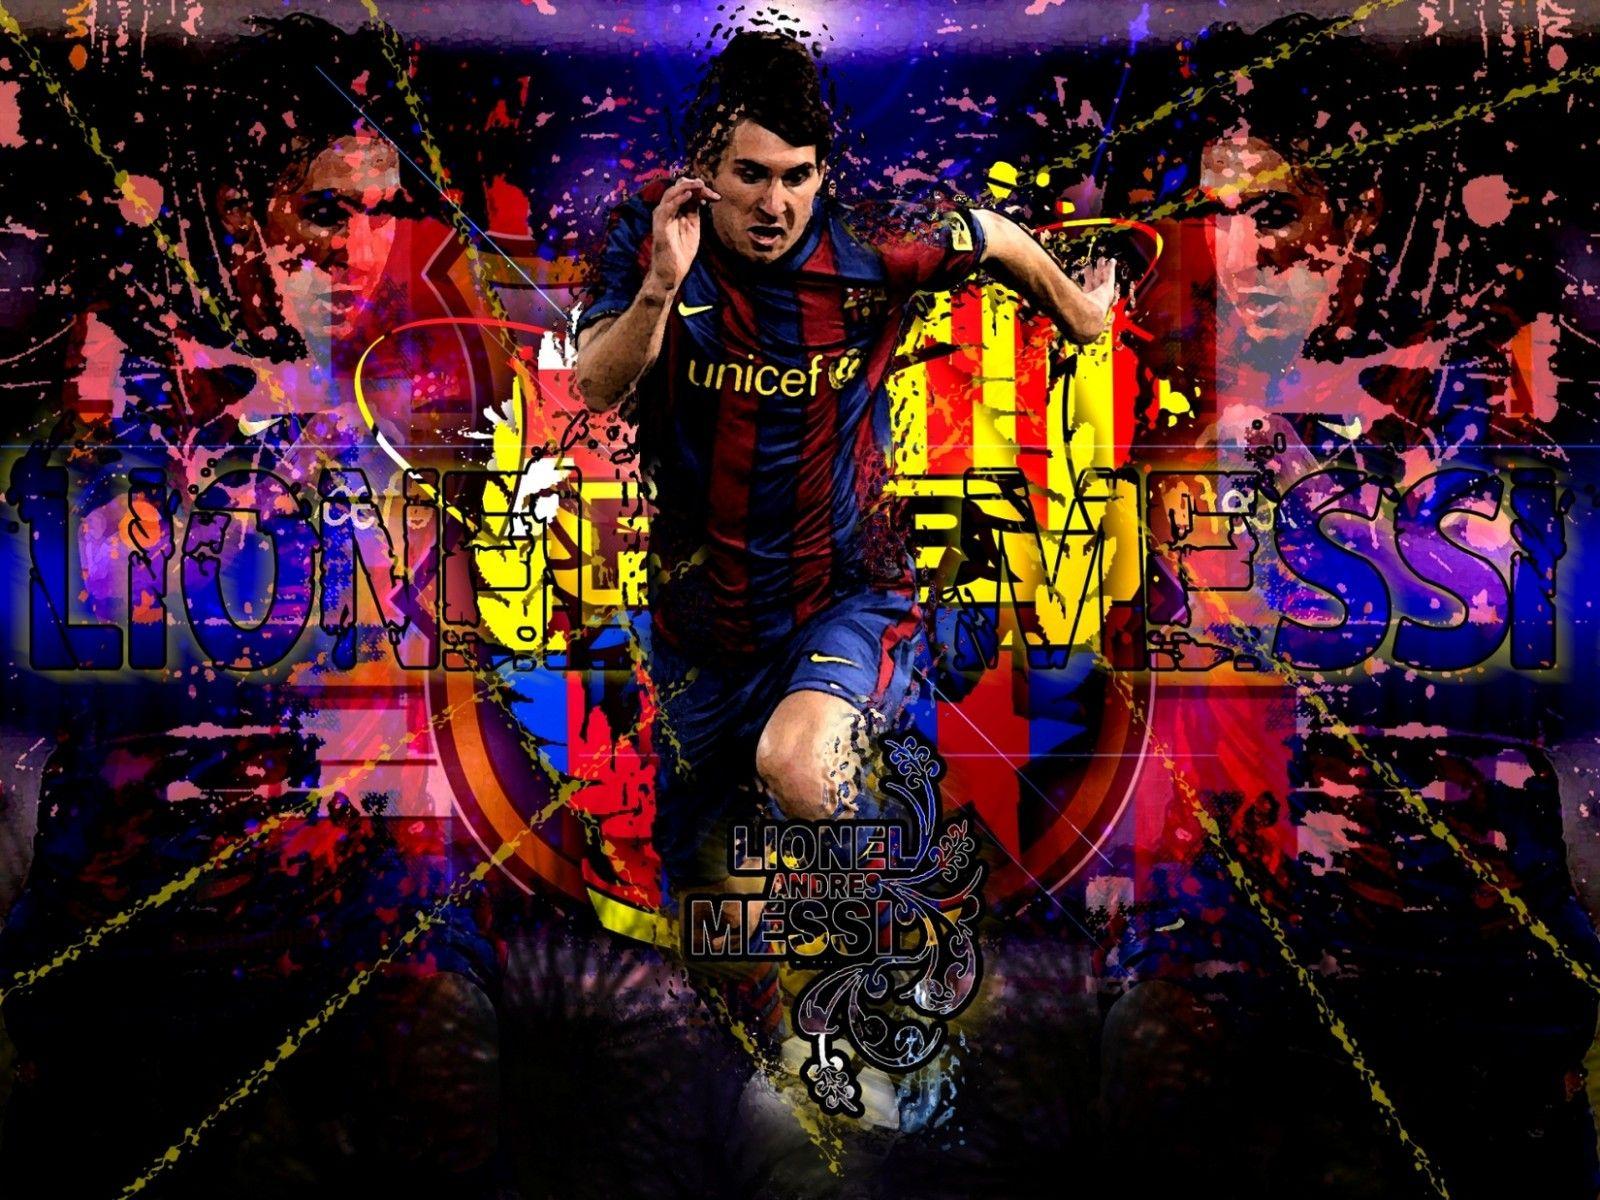 Messi Barcelona Wallpaper 1600x1200 Wallpaper Teahub Io